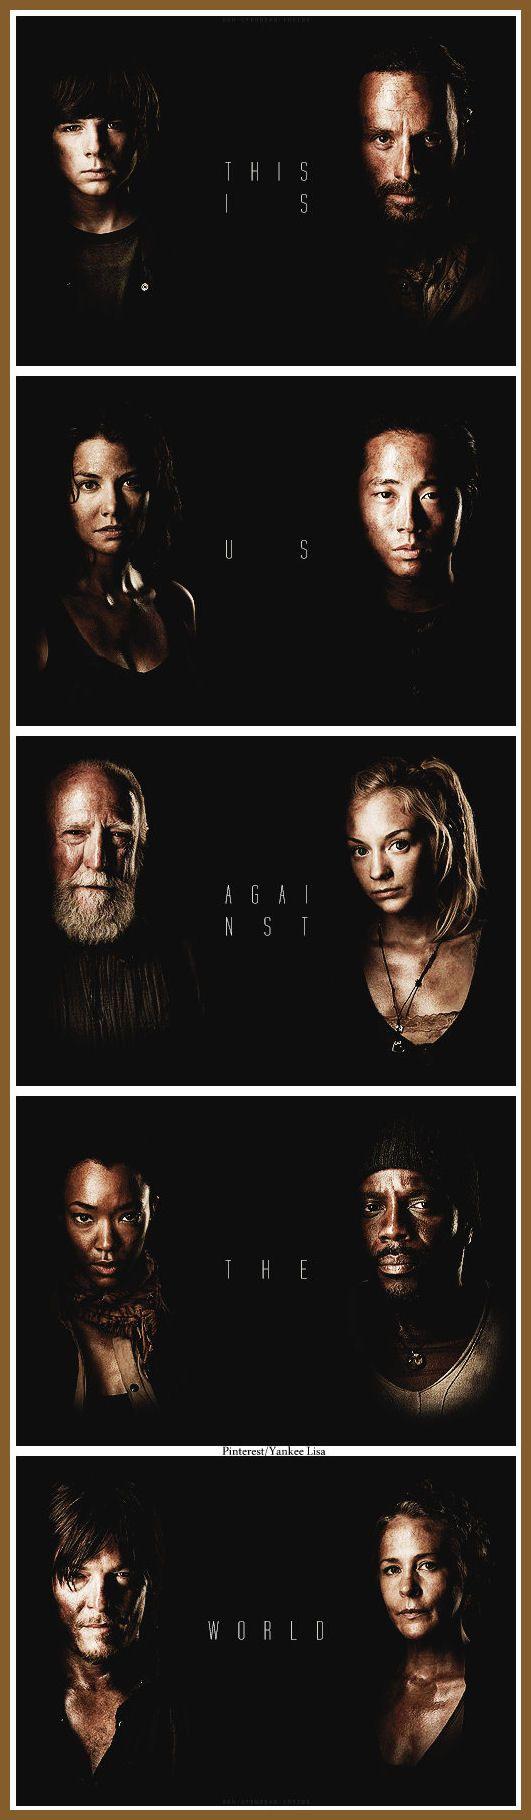 Rick Grimes - Carl Grimes - Daryl Dixon - Carol Peletier - AMC's The Walking Dead